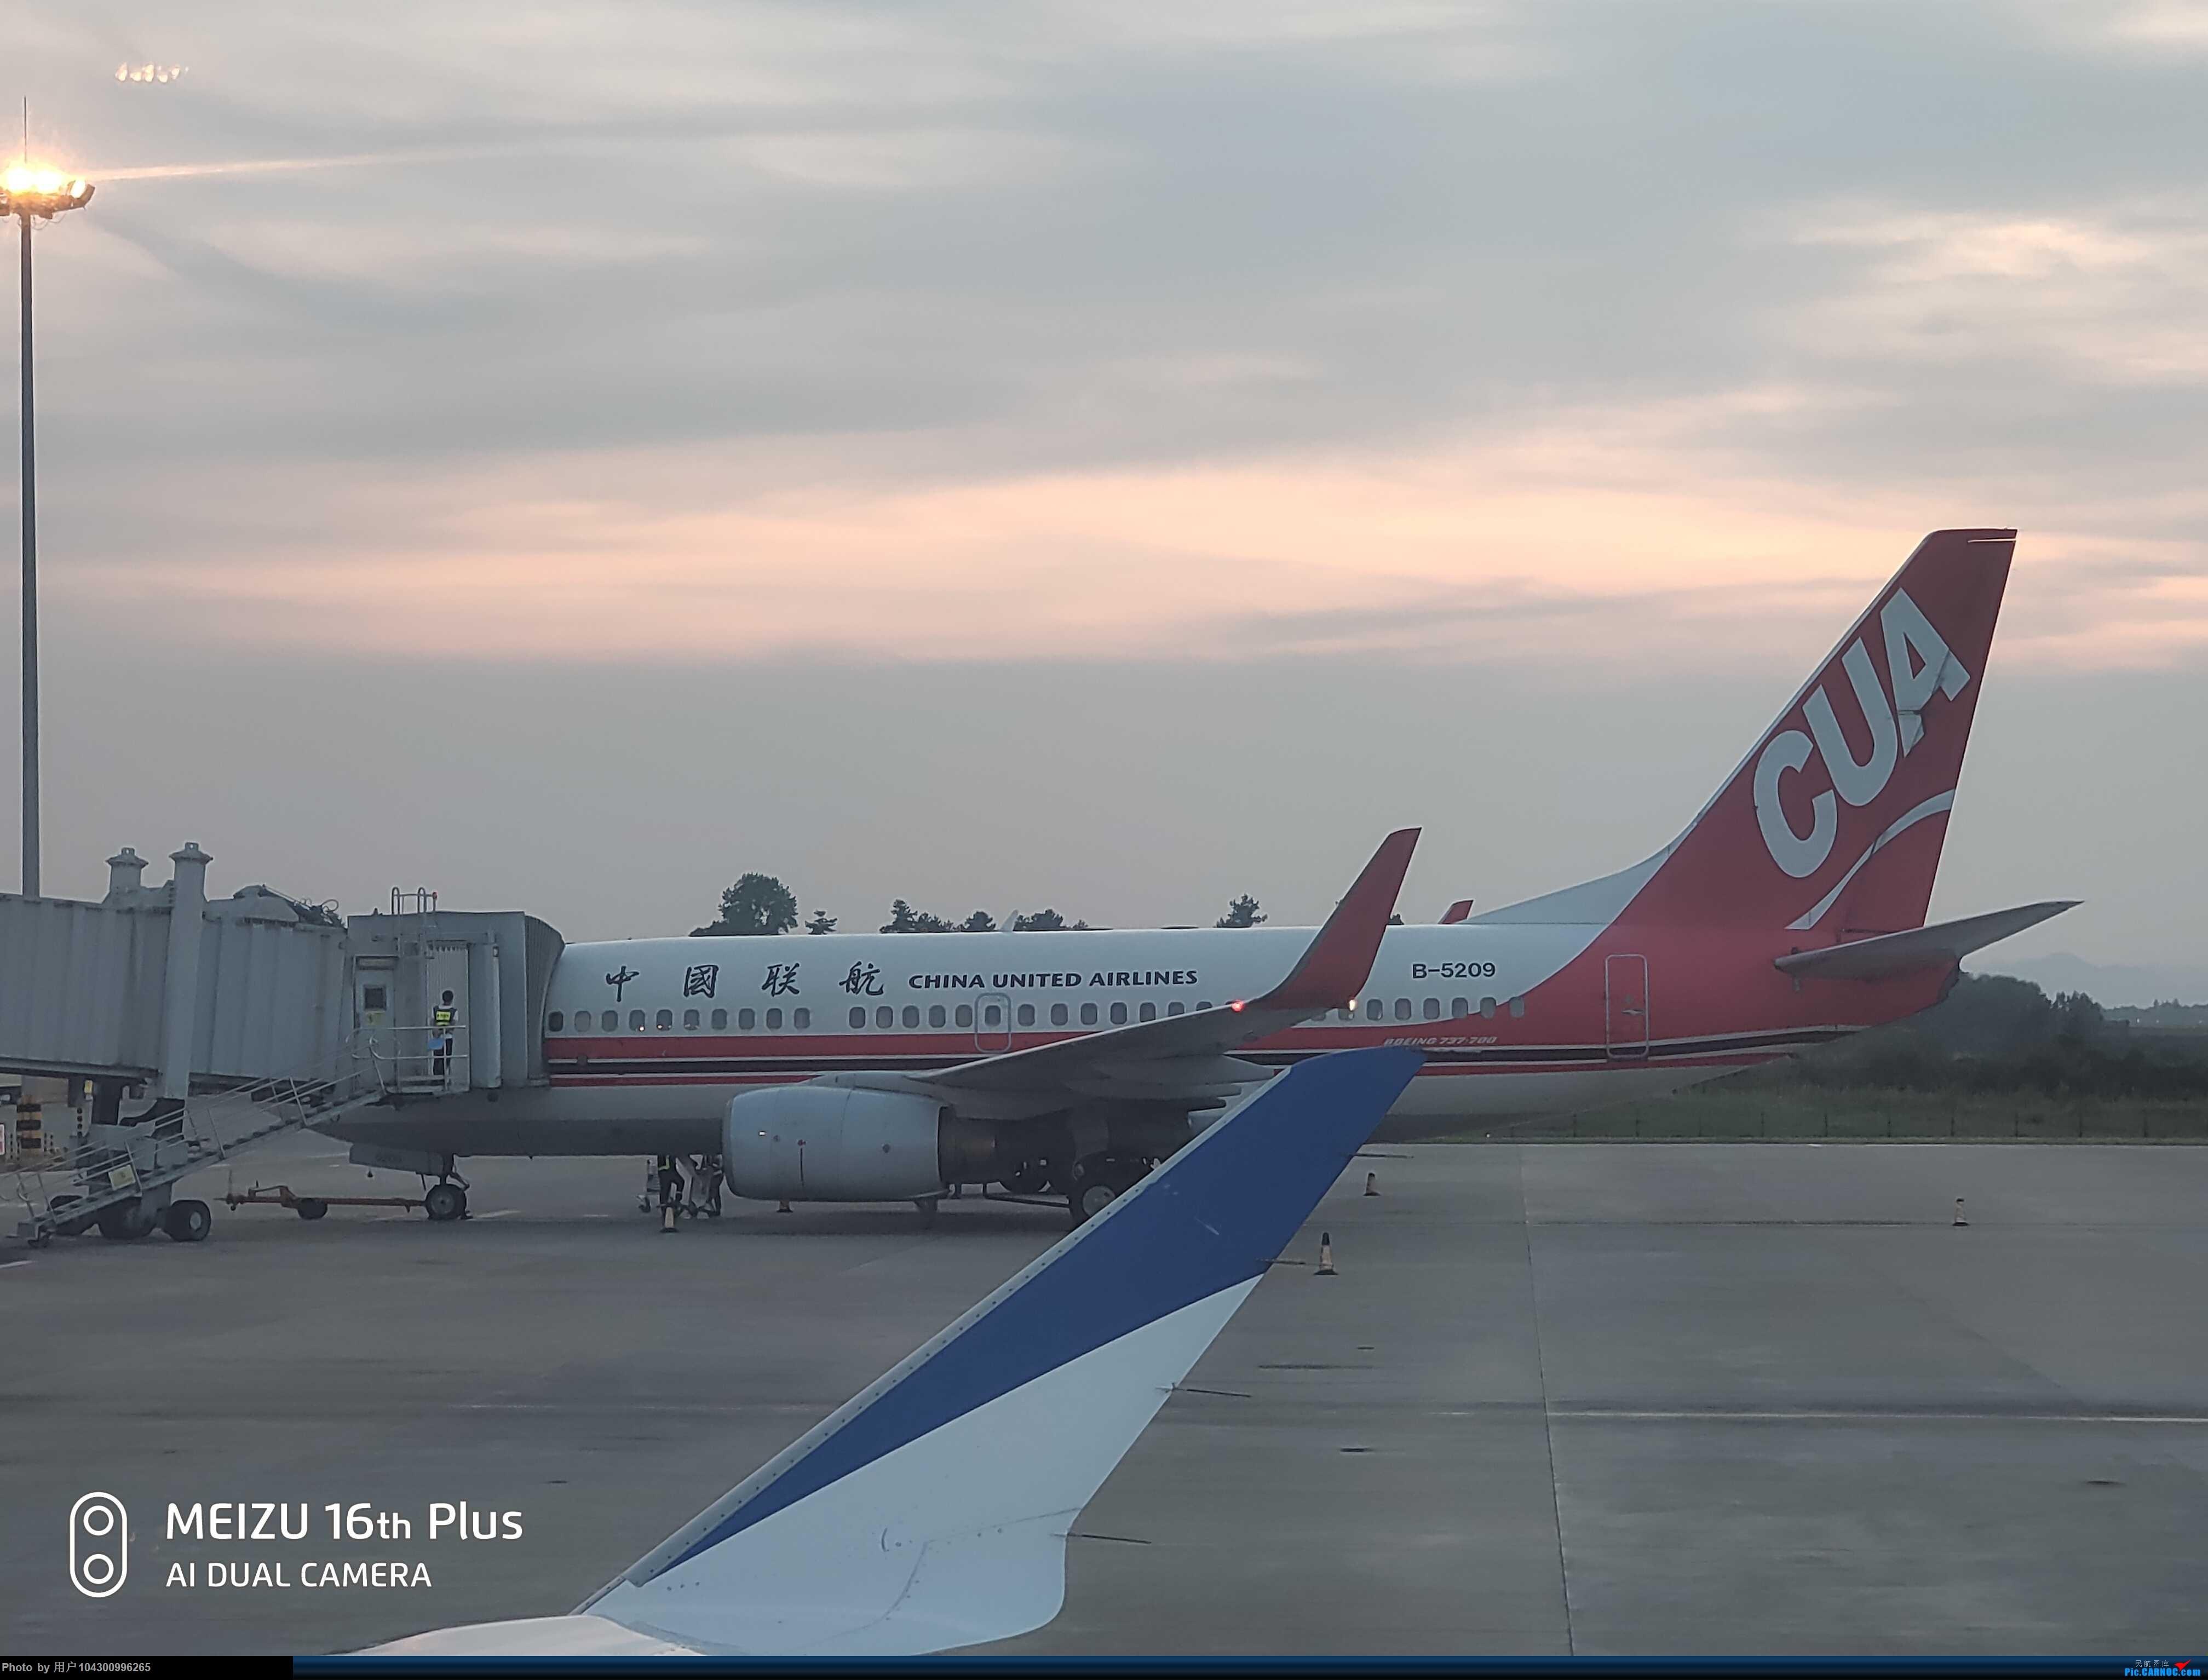 Re:[原创]DM游记之G5毕节--贵阳 BOEING 737-700 B-5209 中国毕节飞雄机场